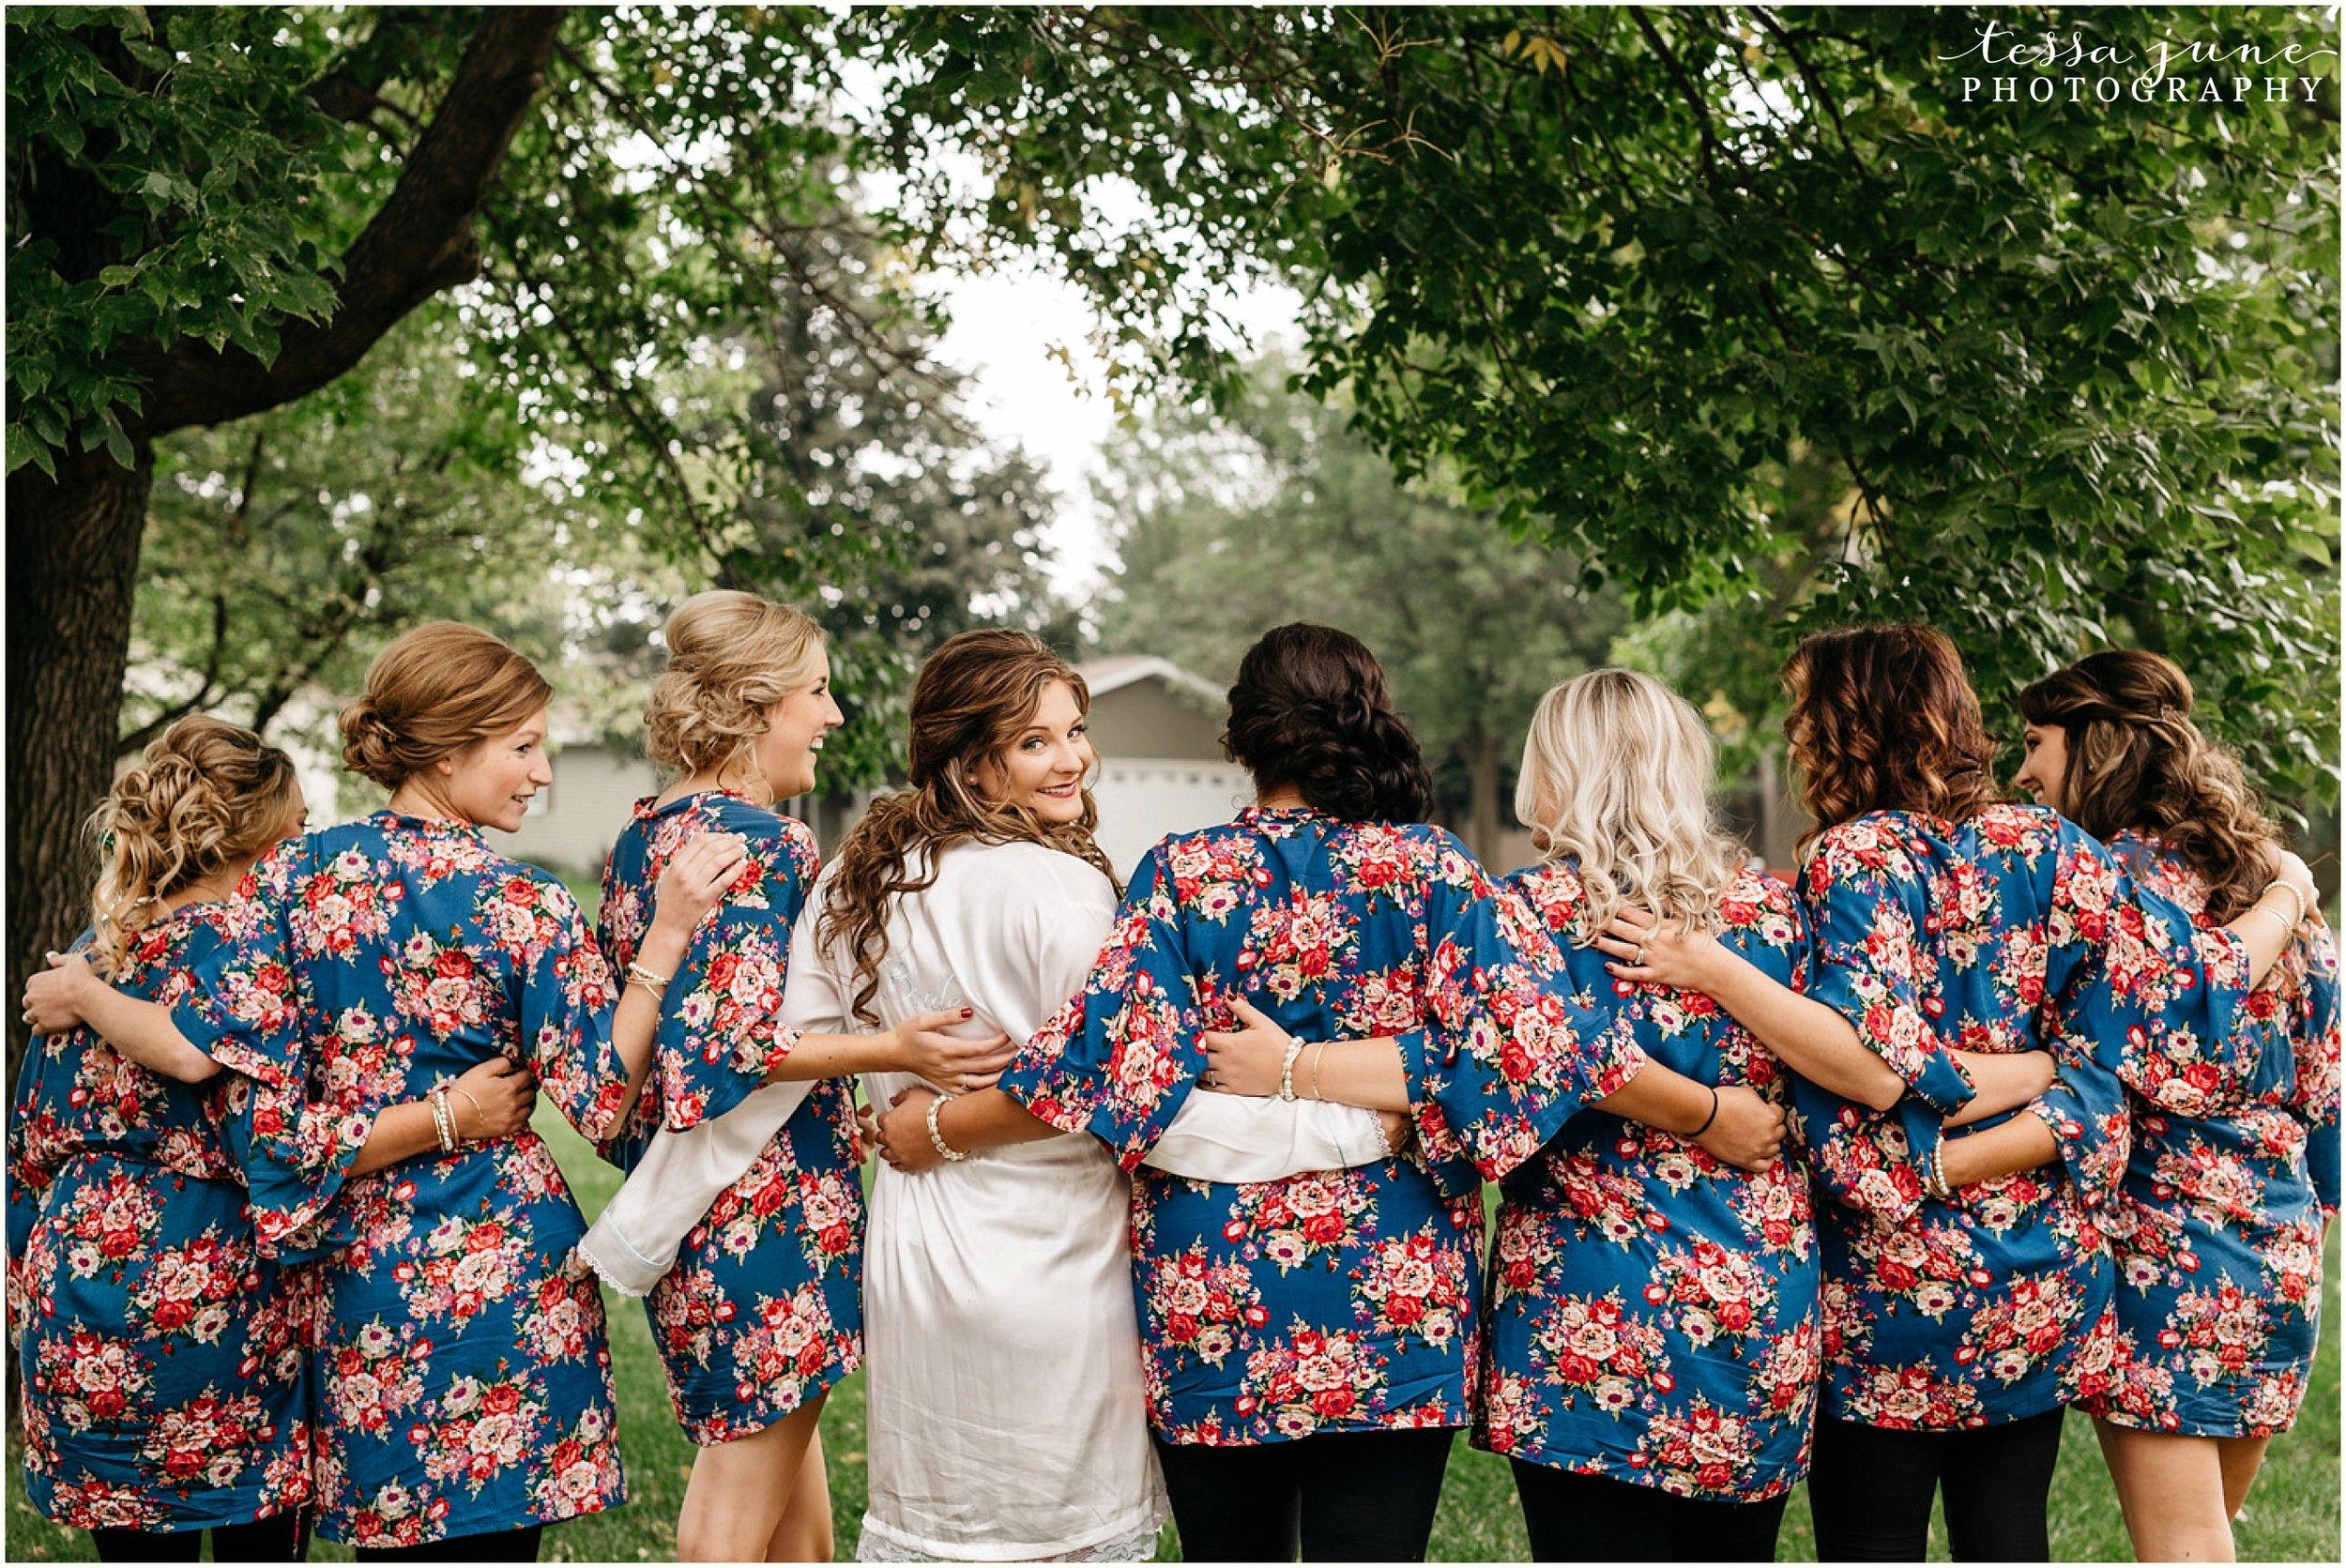 bohemian-minnesota-wedding-mismatched-bridesmaid-dresses-waterfall-st-cloud-tessa-june-photography-21.jpg